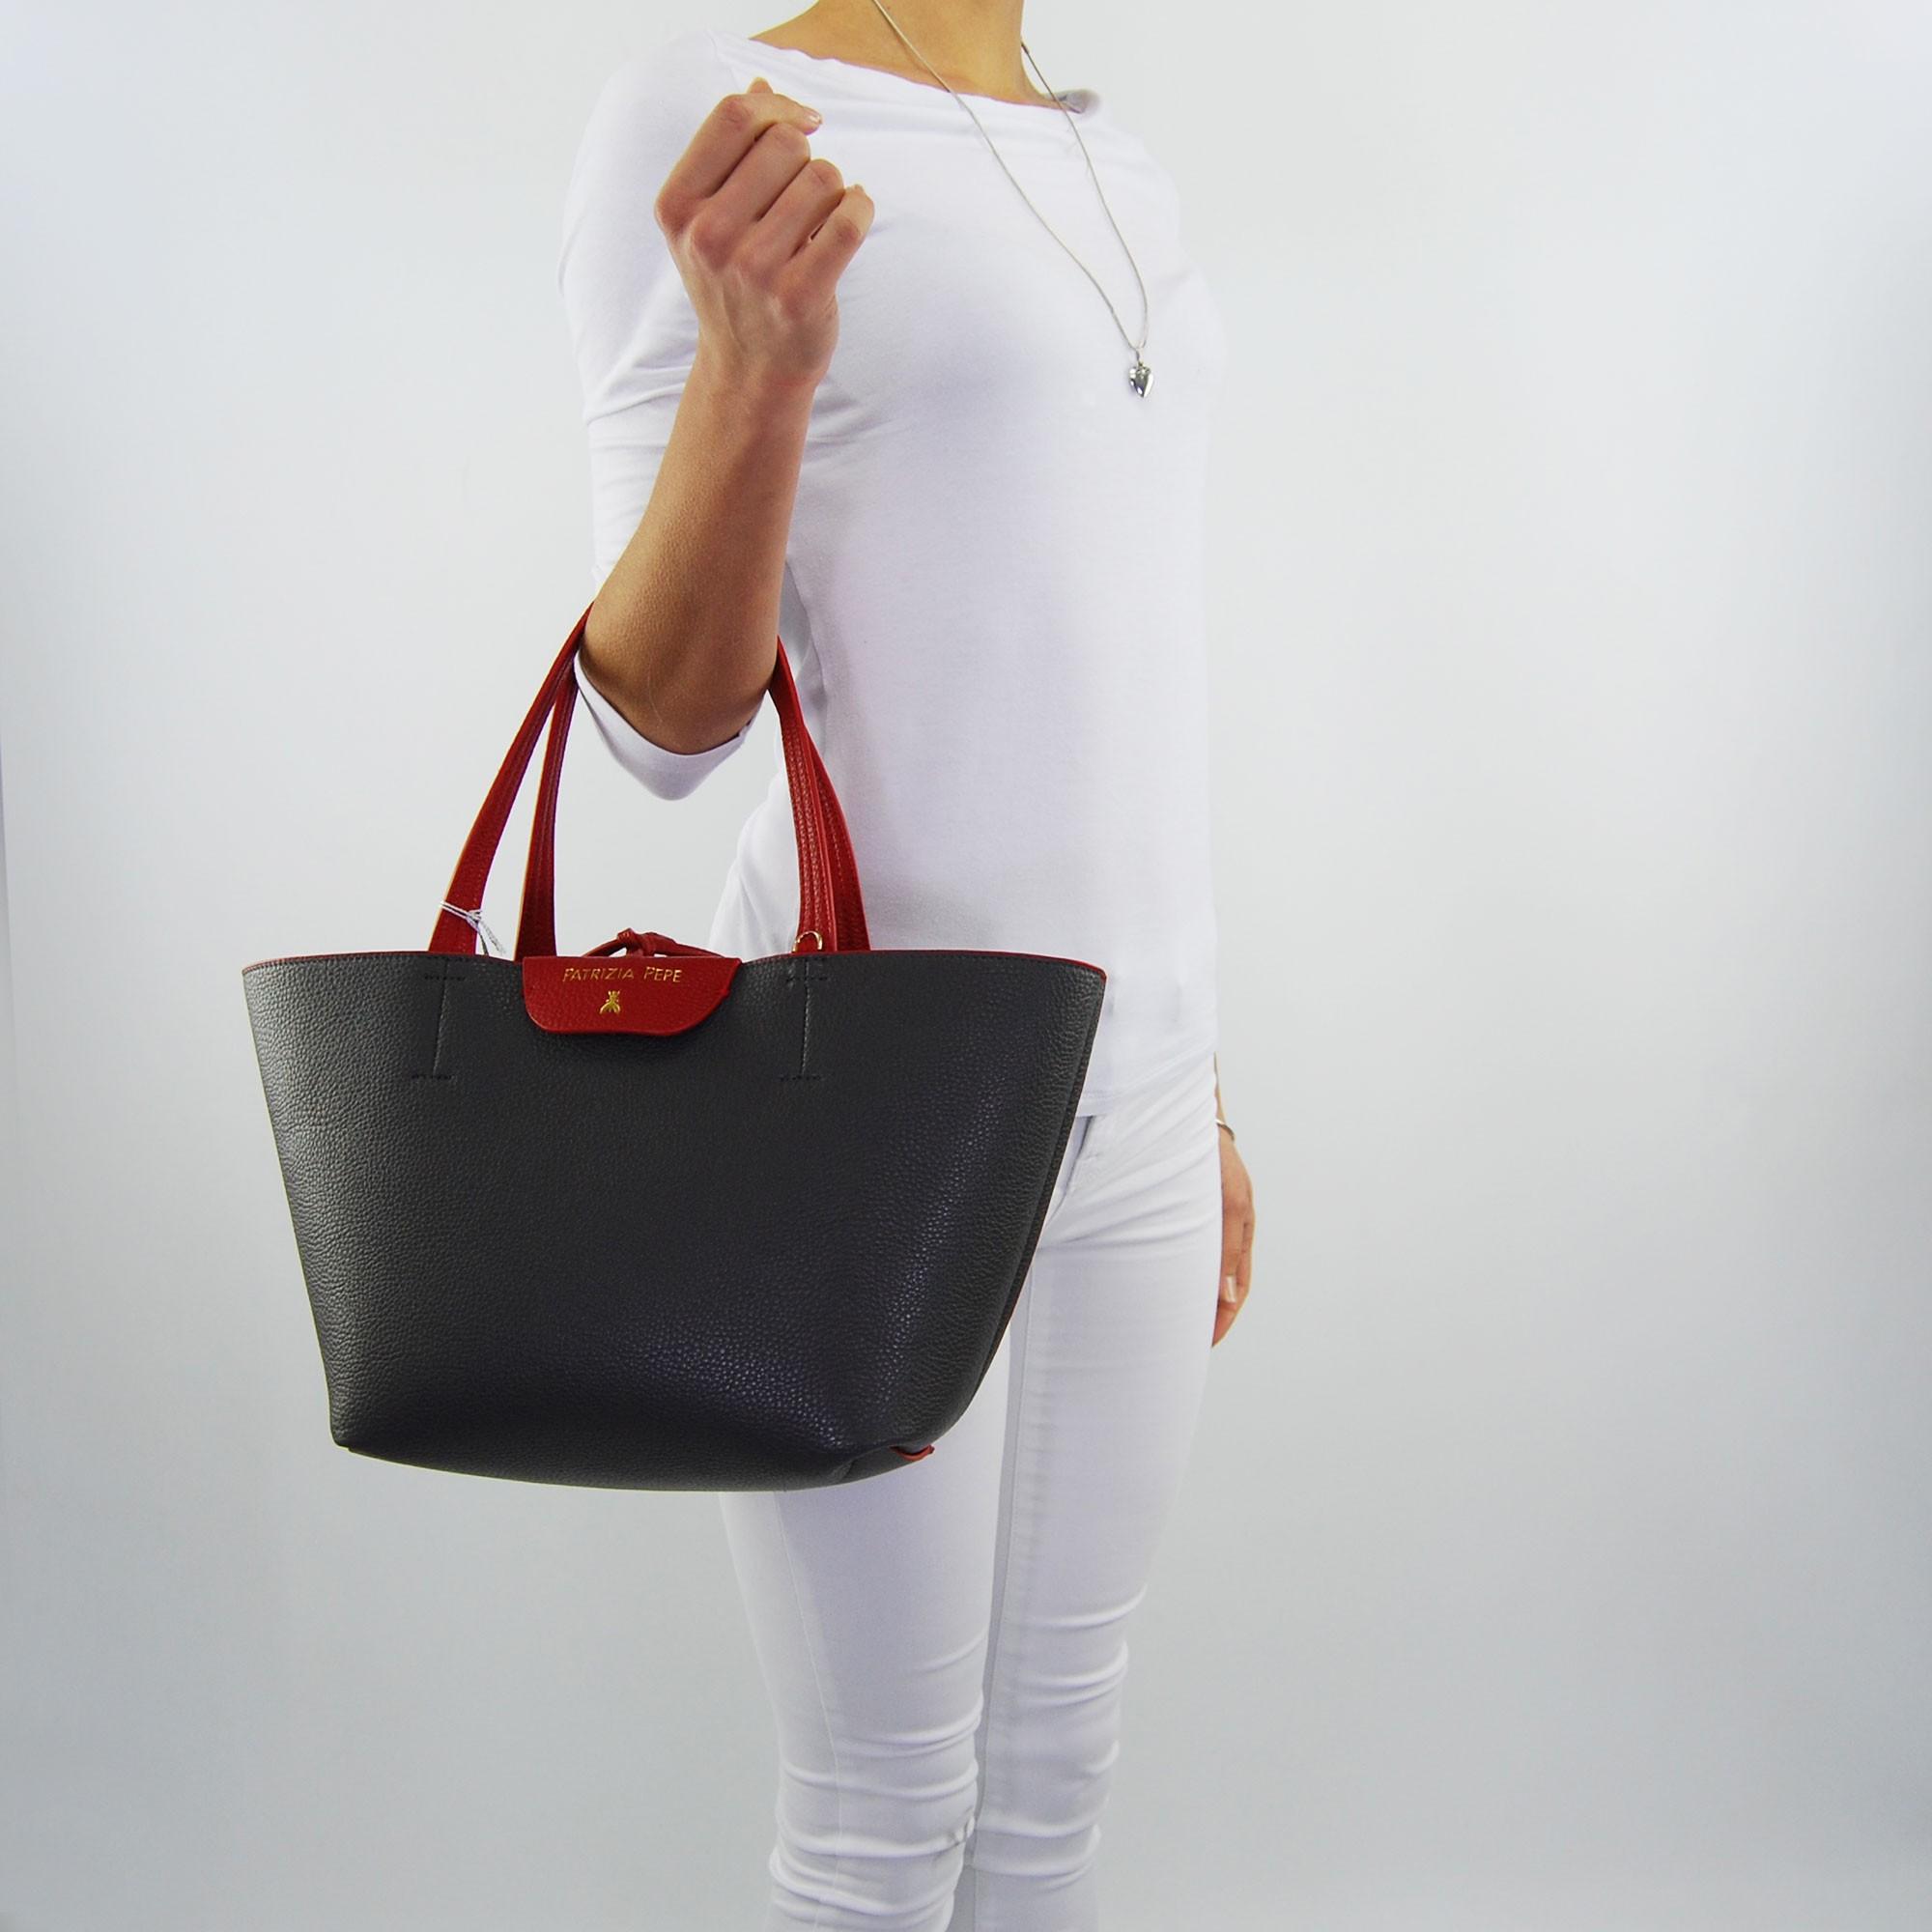 3210c94732 Shopping bag by Patrizia Pepe reversible matt red dark grey